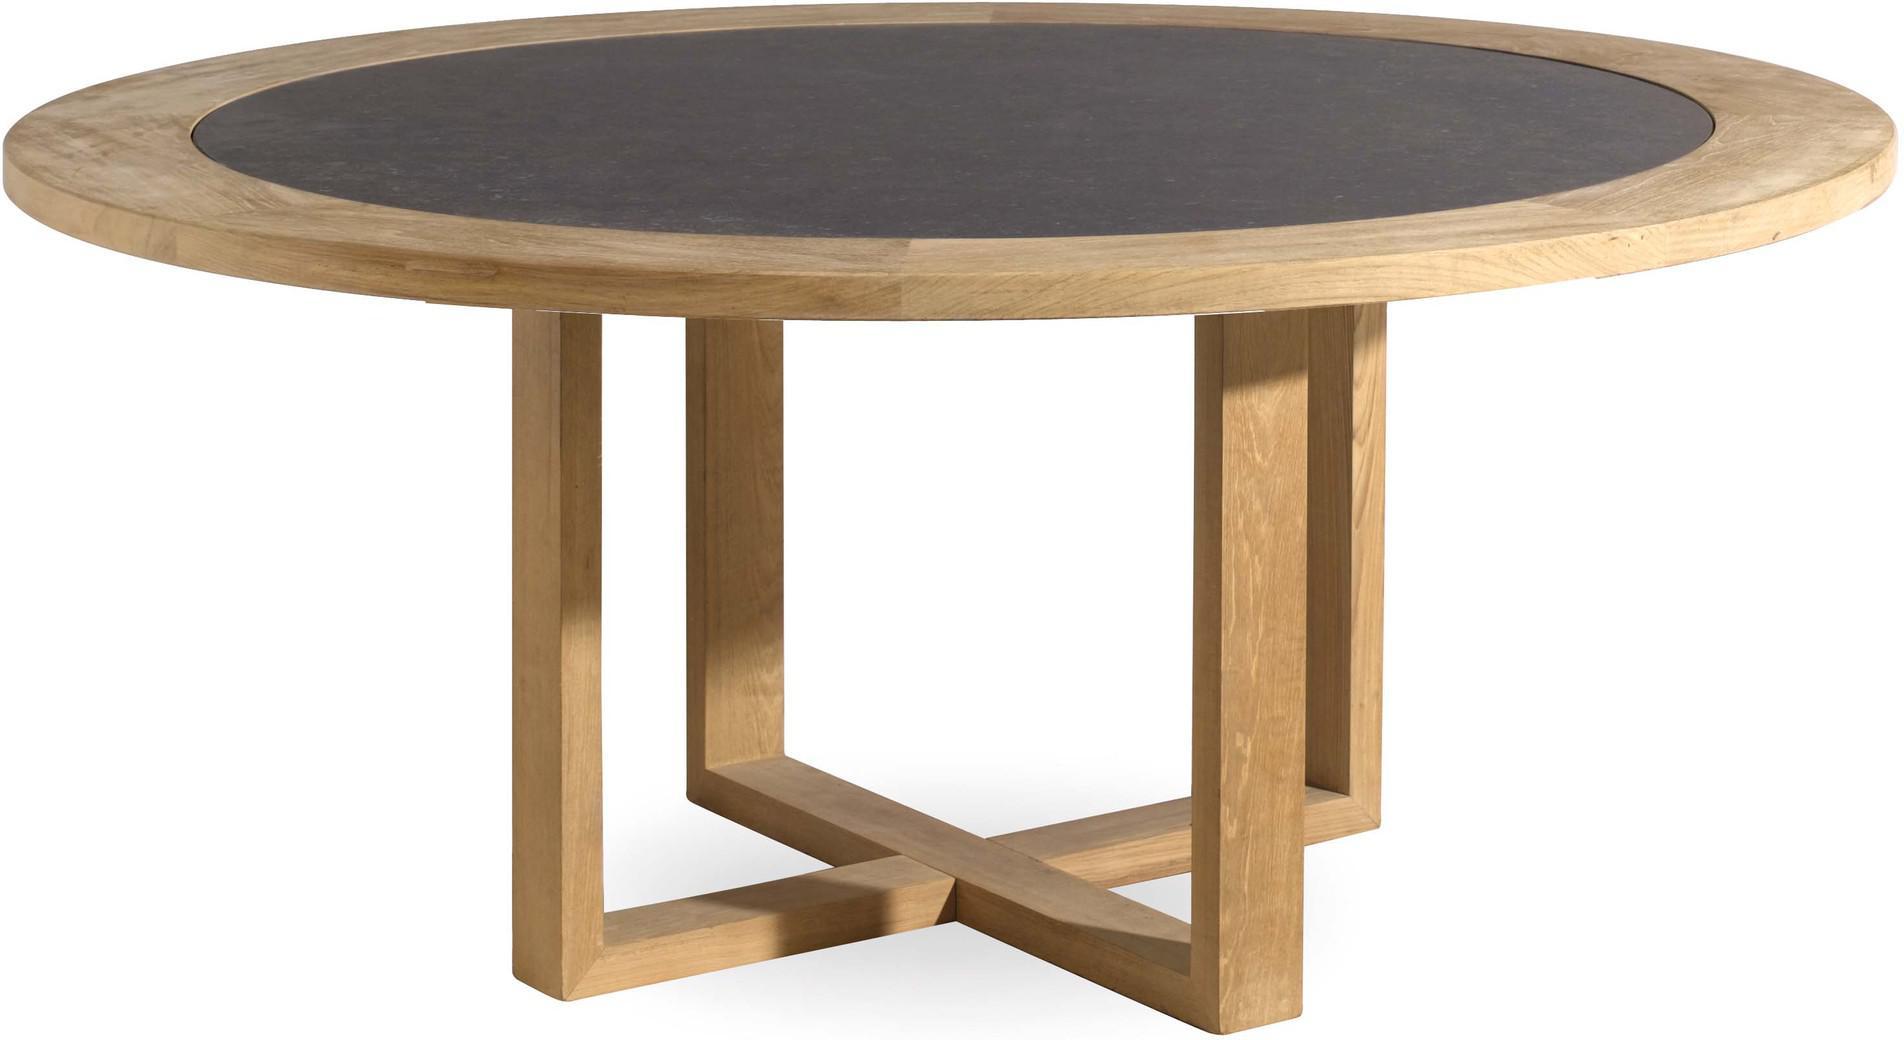 Siena Dining table - Teak - 40BD 180